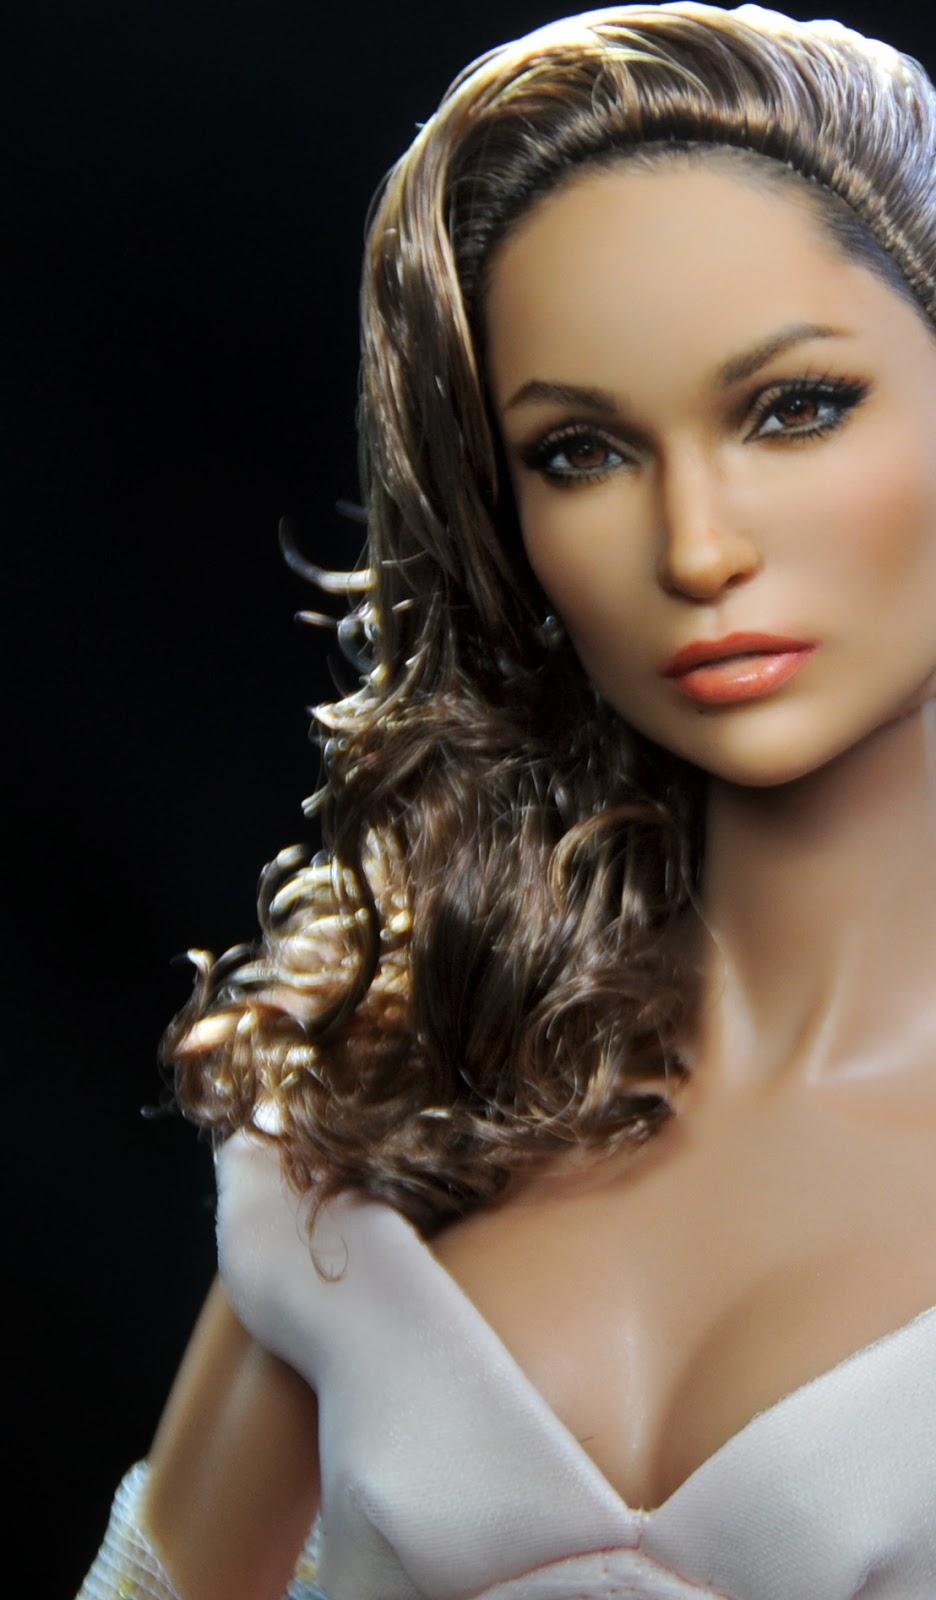 Jennifer Lopez Repainted By Artist Noel Cruz